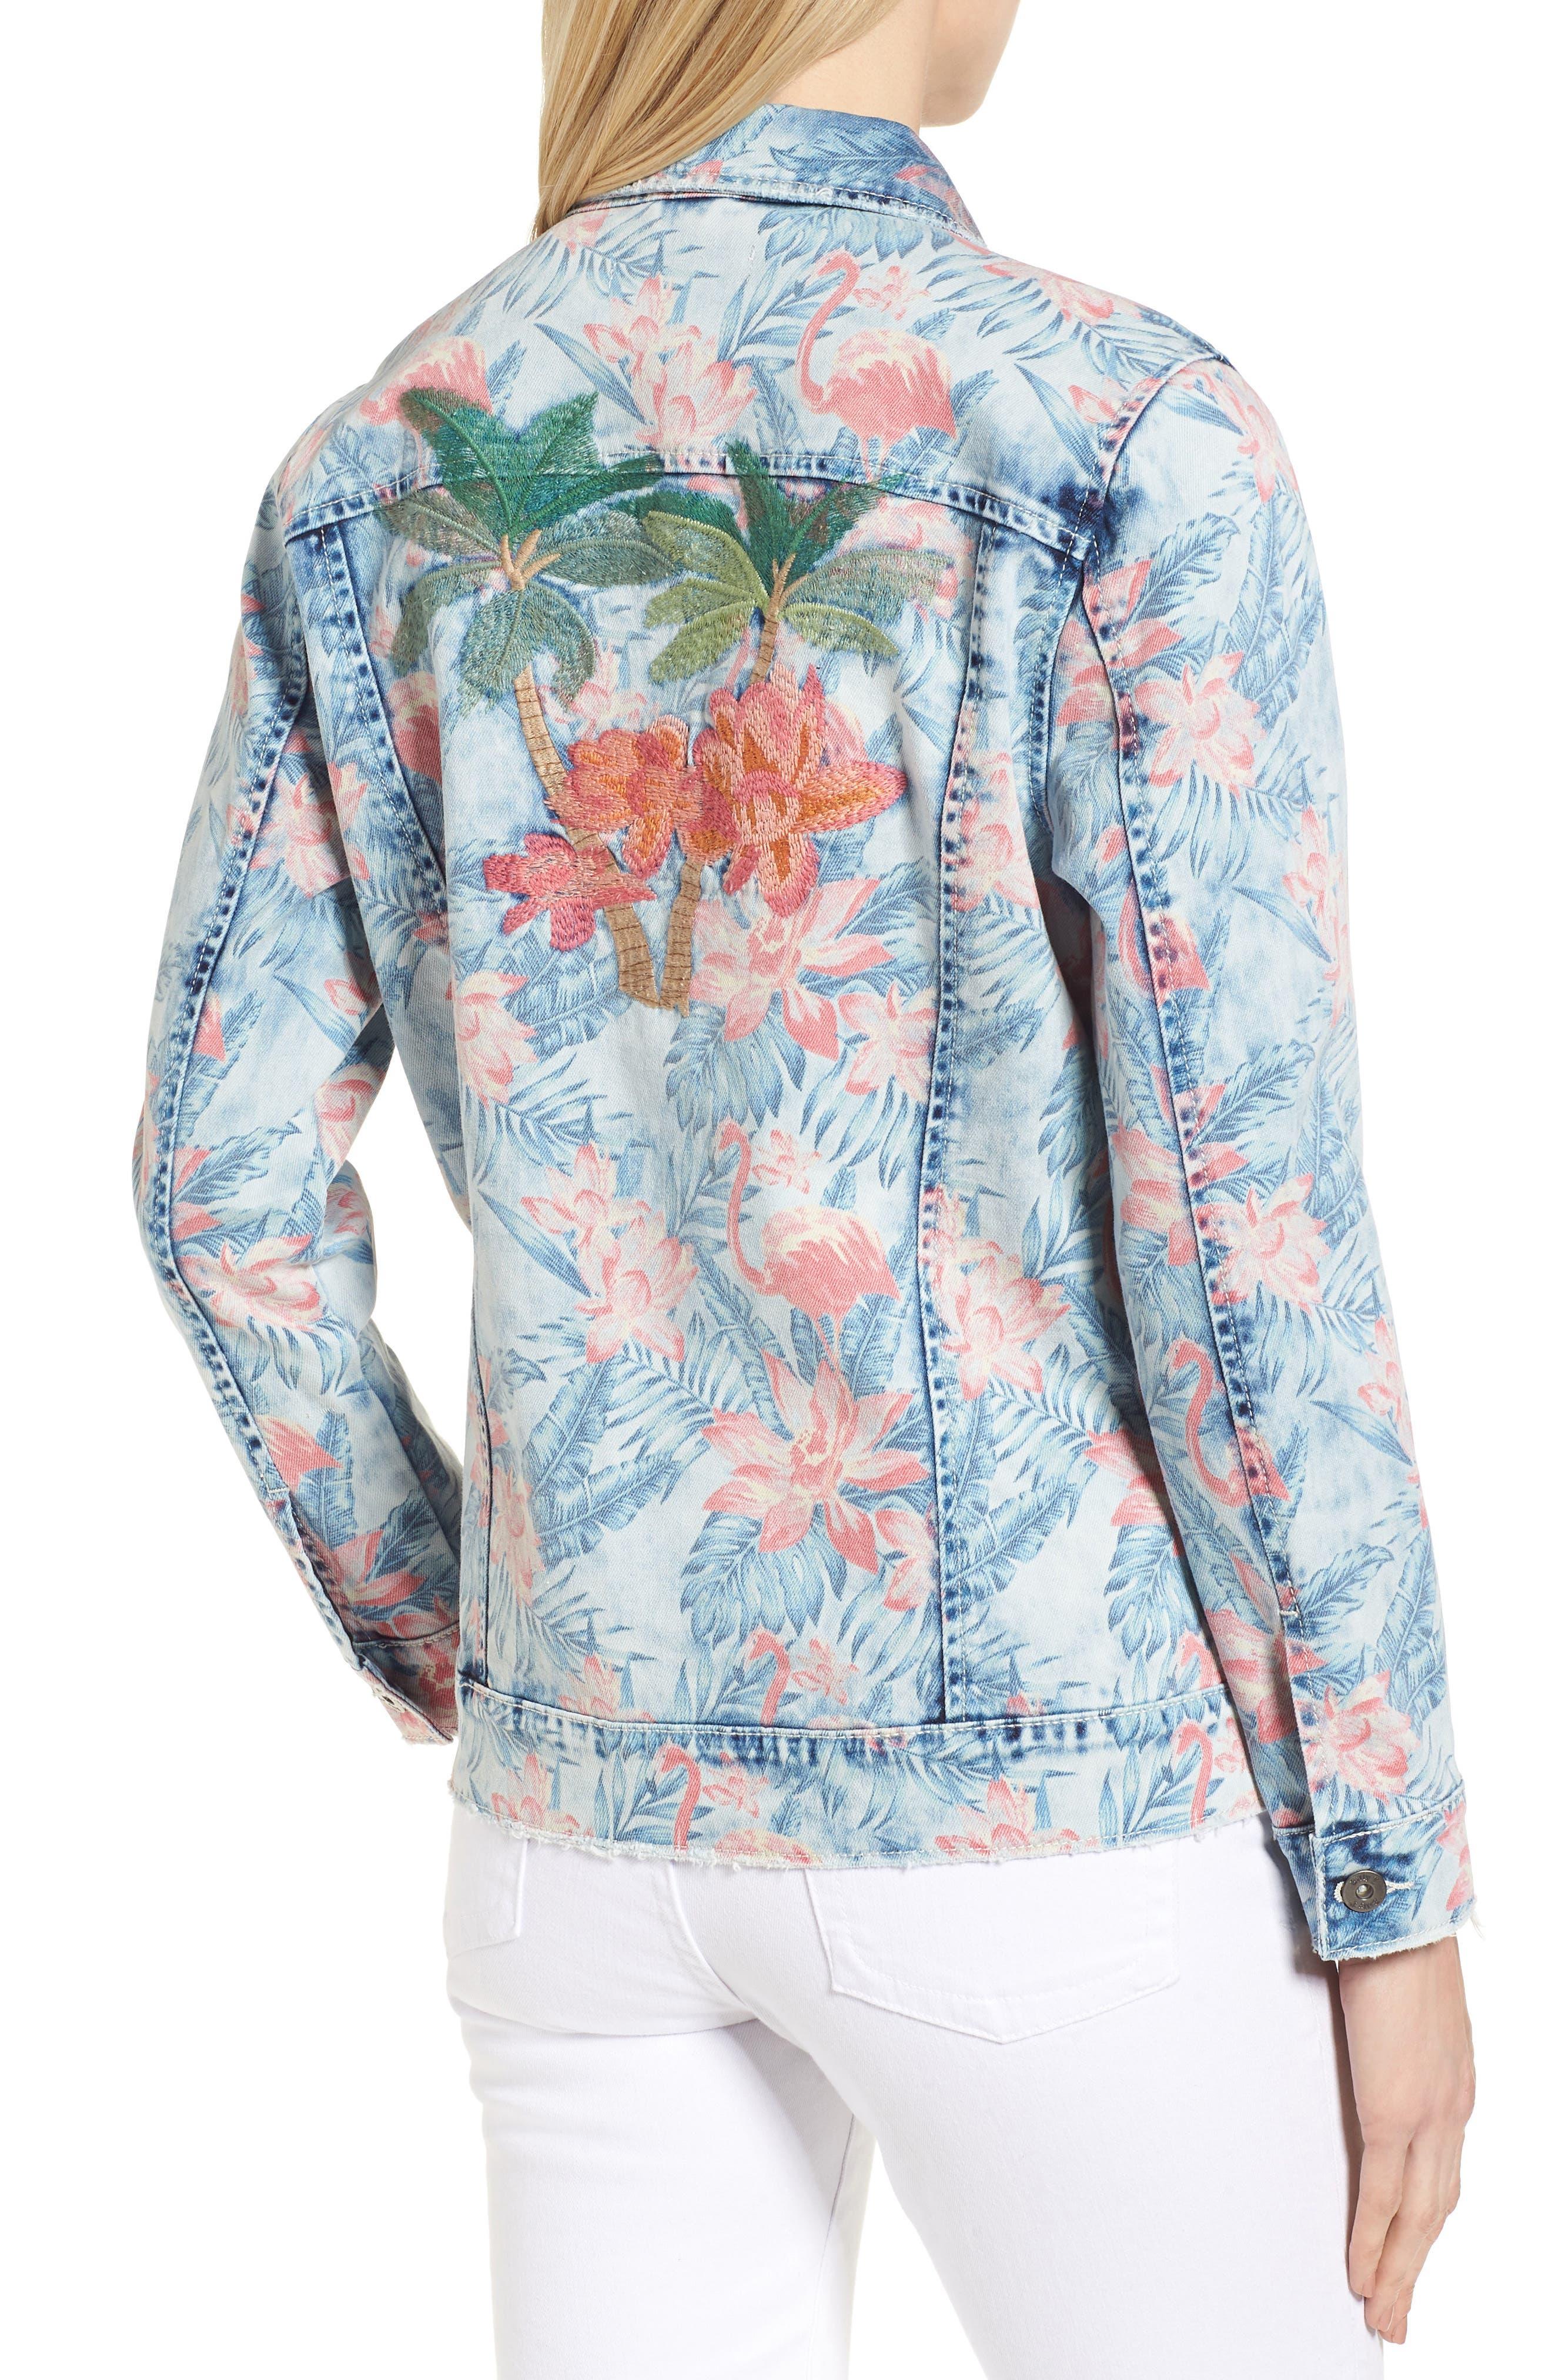 Embroidered Floral Denim Jacket,                             Alternate thumbnail 2, color,                             Light Blue Paradise